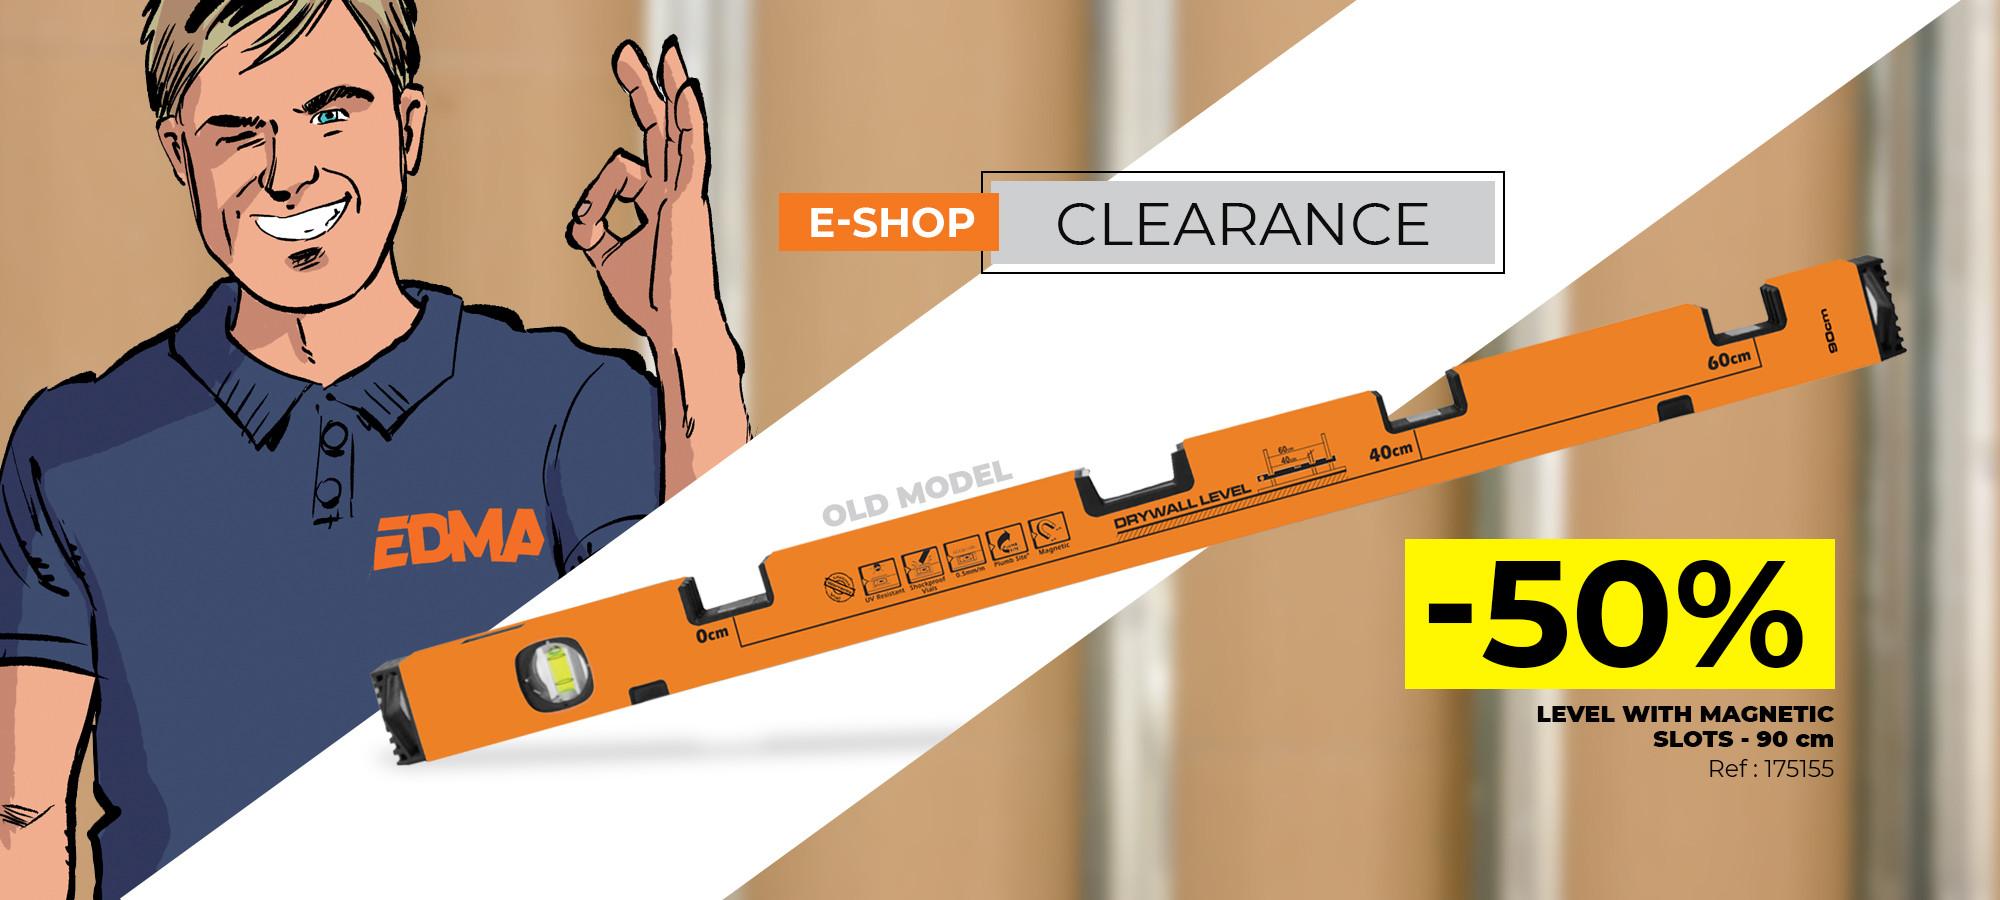 E-SHOP CLEARANCE